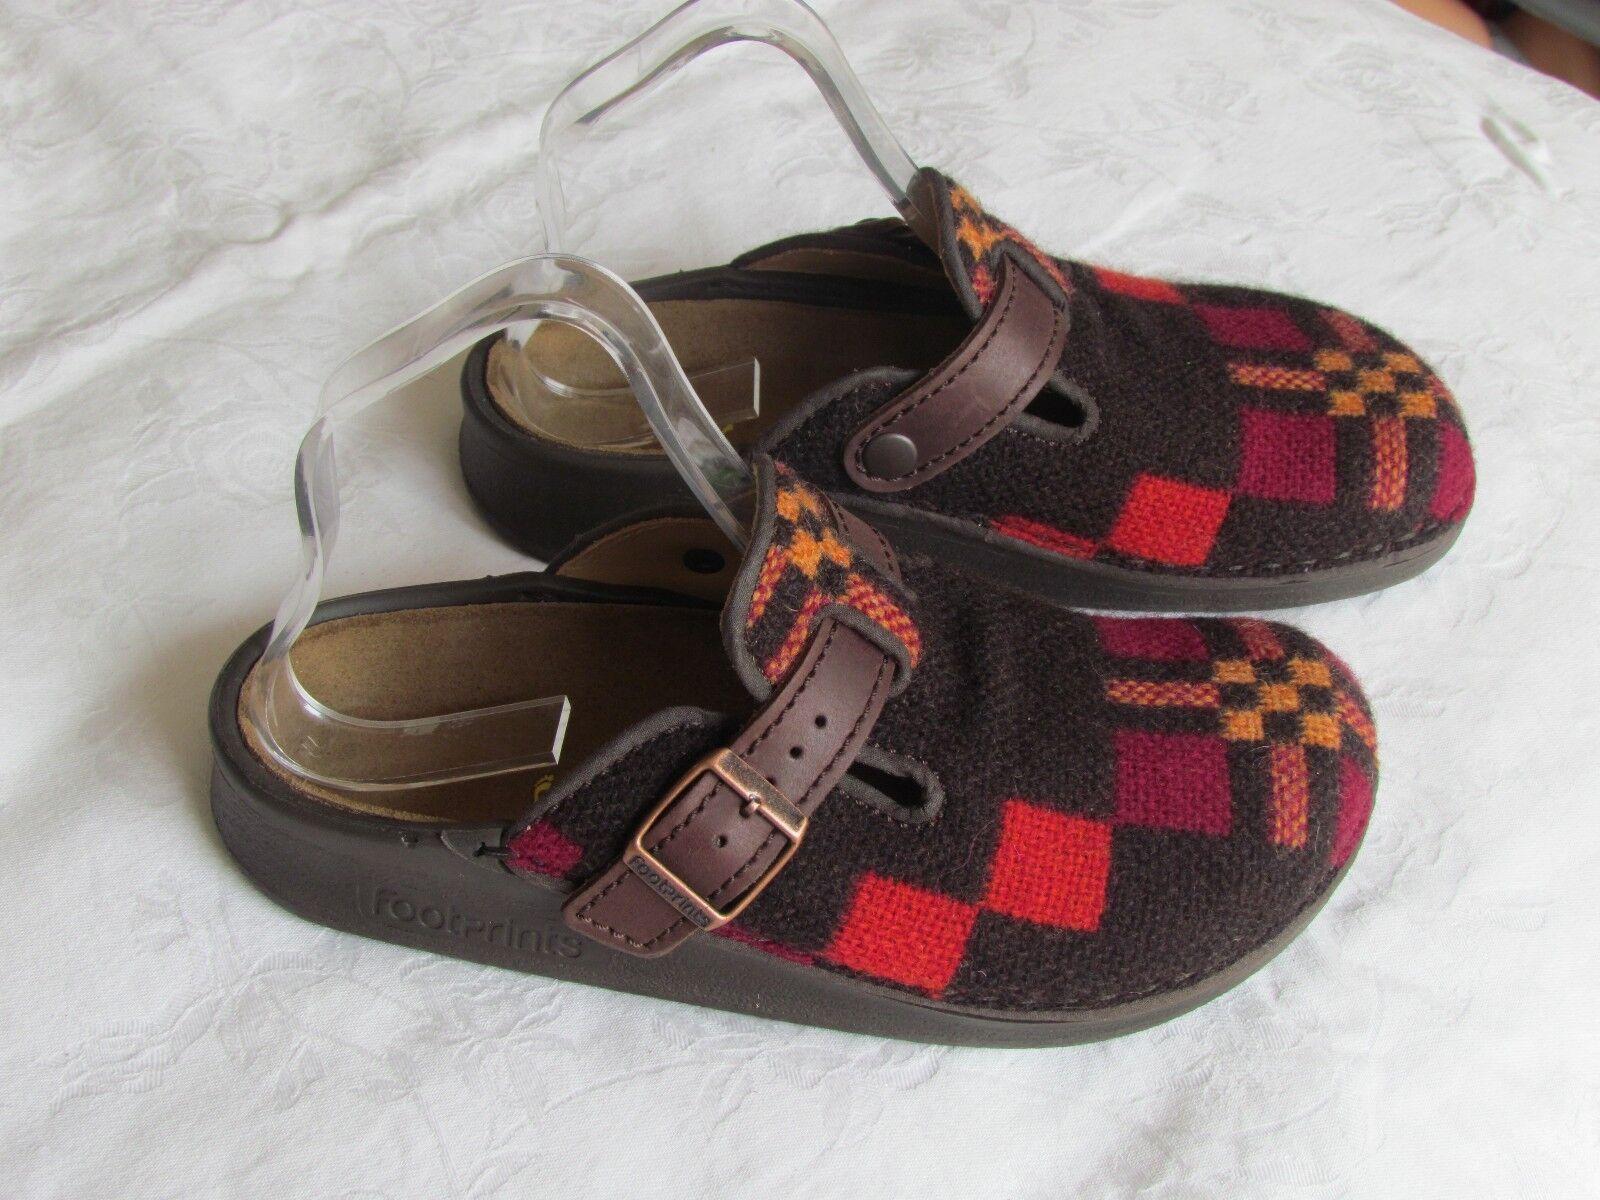 RARE NEW Birkenstock Ladies Ladies Birkenstock Brown & Orange Clogs Sandals Slippers Size 5 25ccae